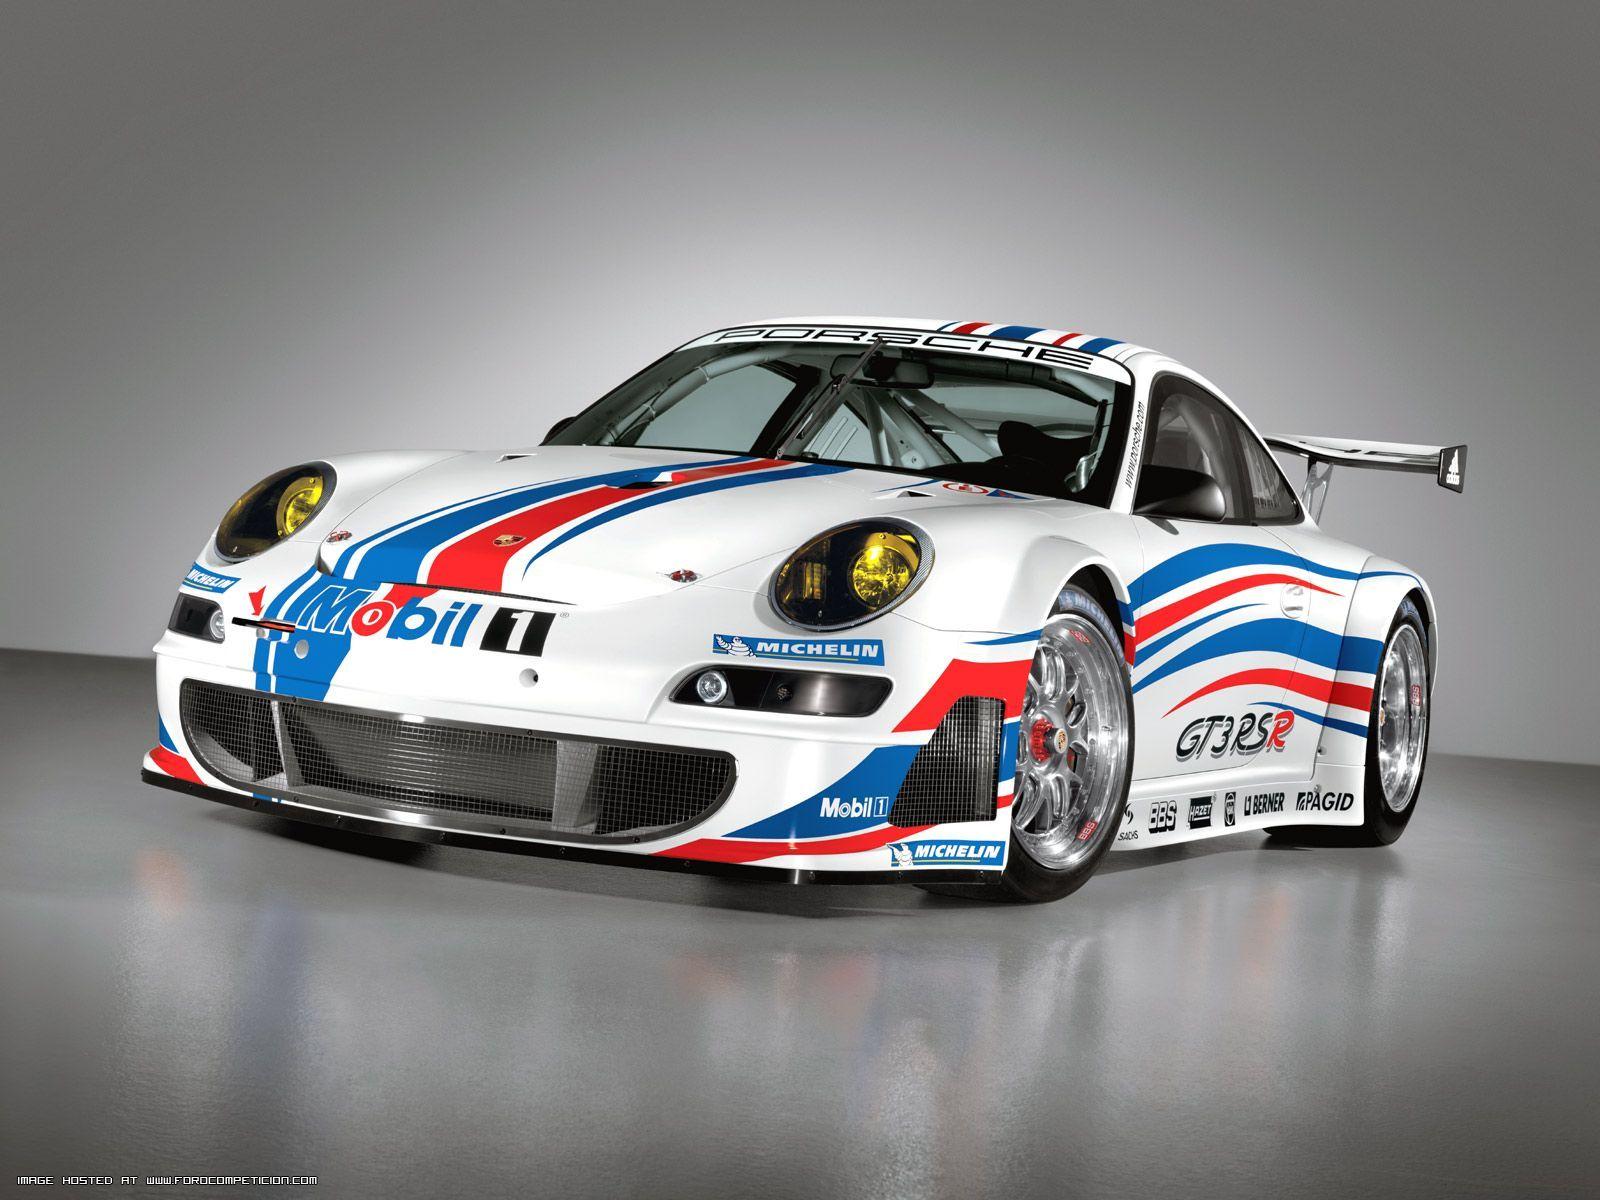 Rennsport Porsche Autos Rennsport Porsche Carrera